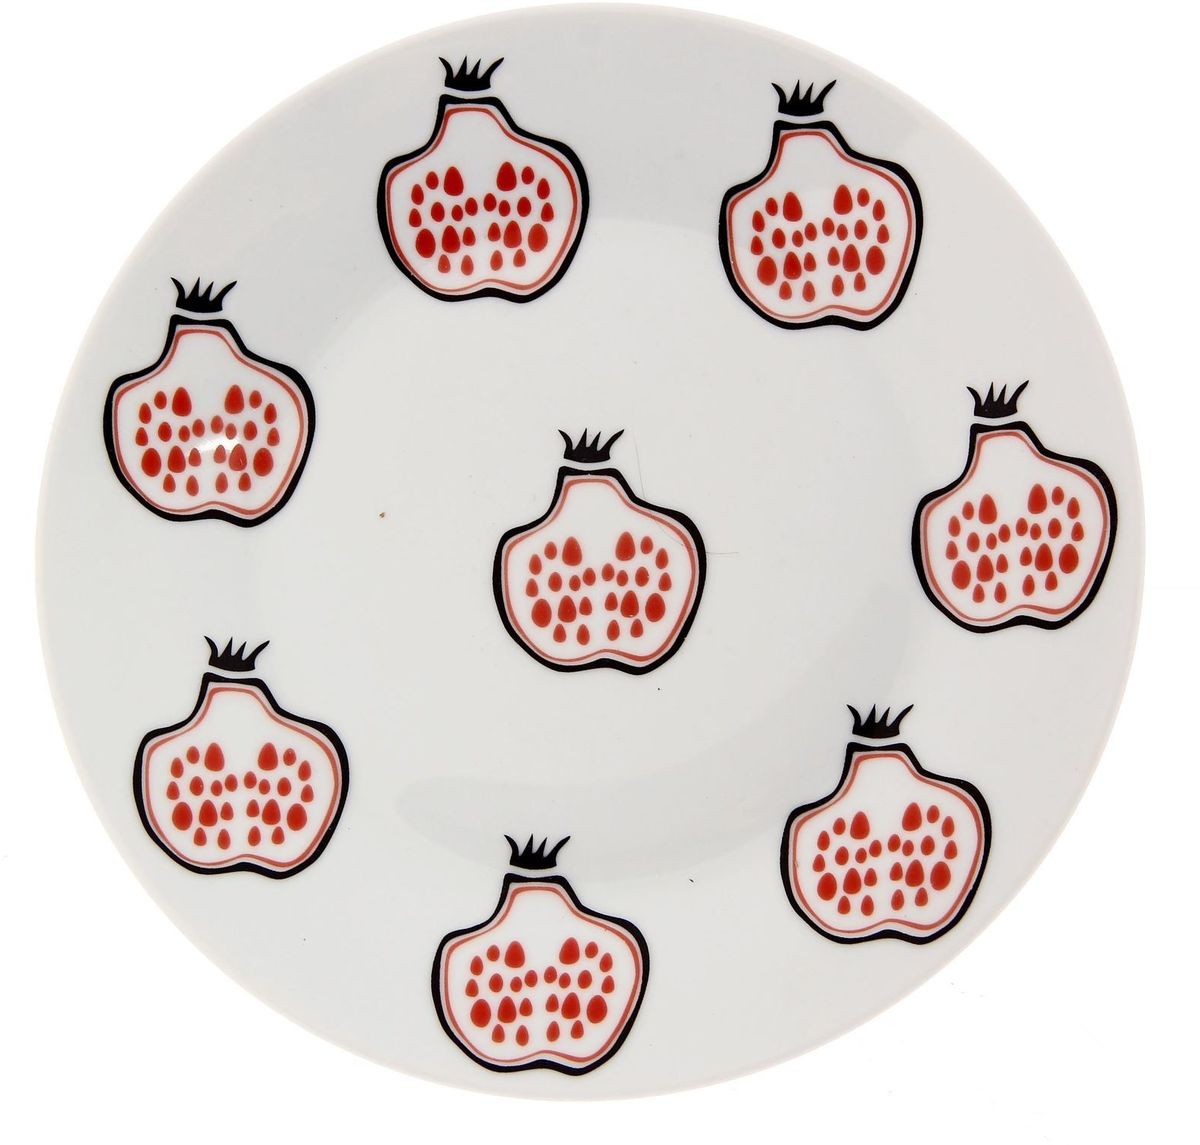 Тарелка мелкая Сотвори чудо Гранат, диаметр 20 см тарелка мелкая сотвори чудо полярный мишка диаметр 20 см